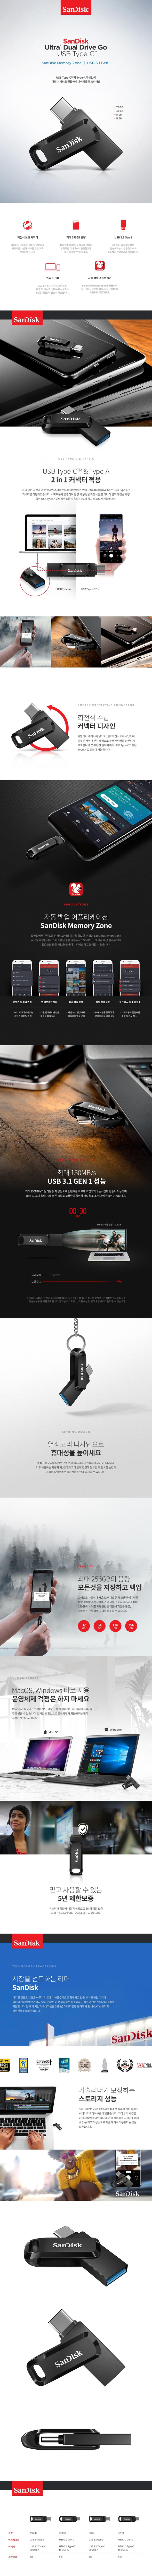 Sandisk Ultra Dual Drive Go Type C (256GB)